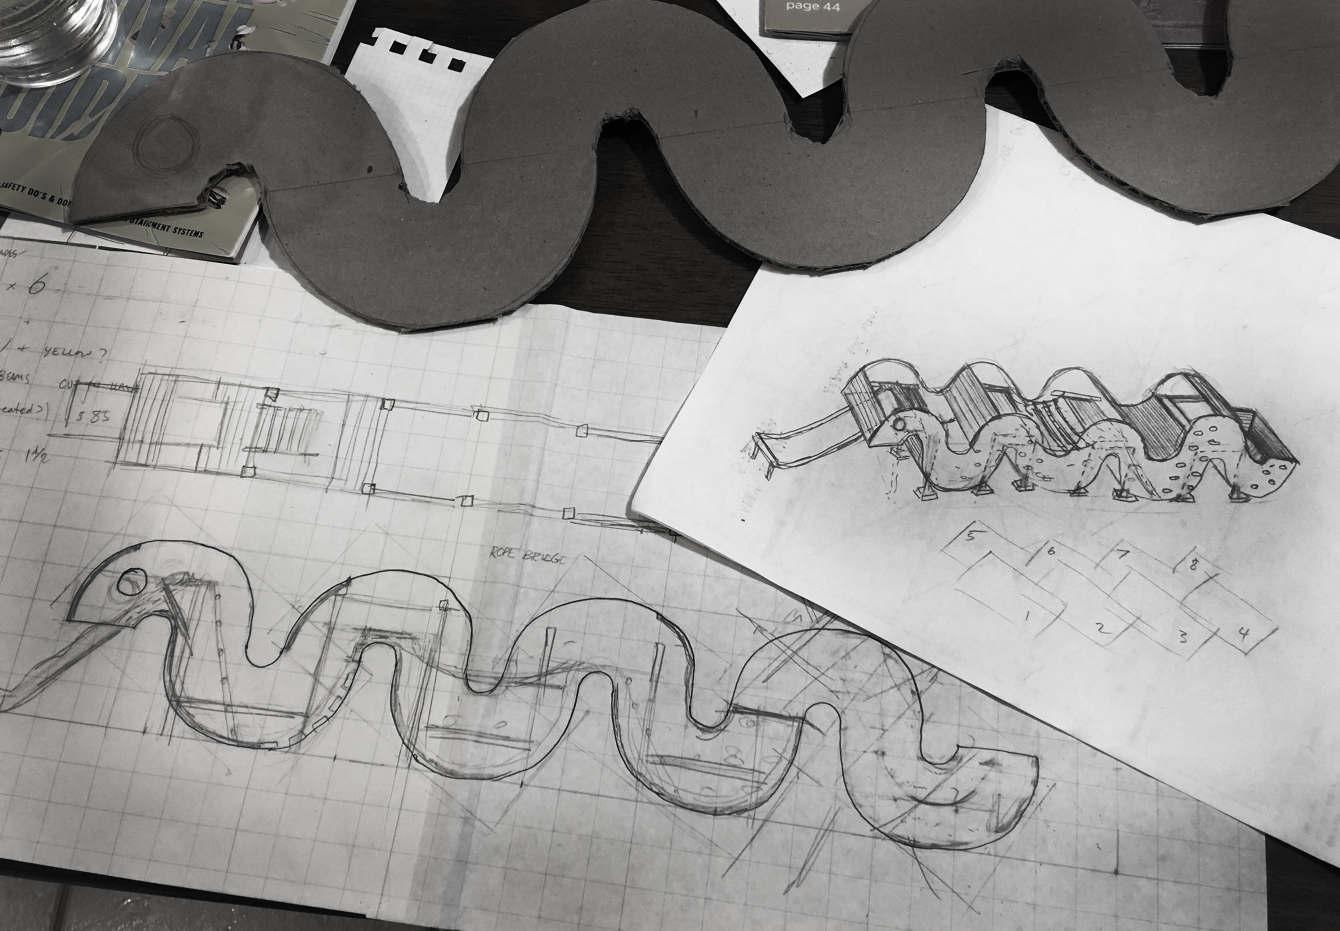 snake-sketch_1340_c.jpg